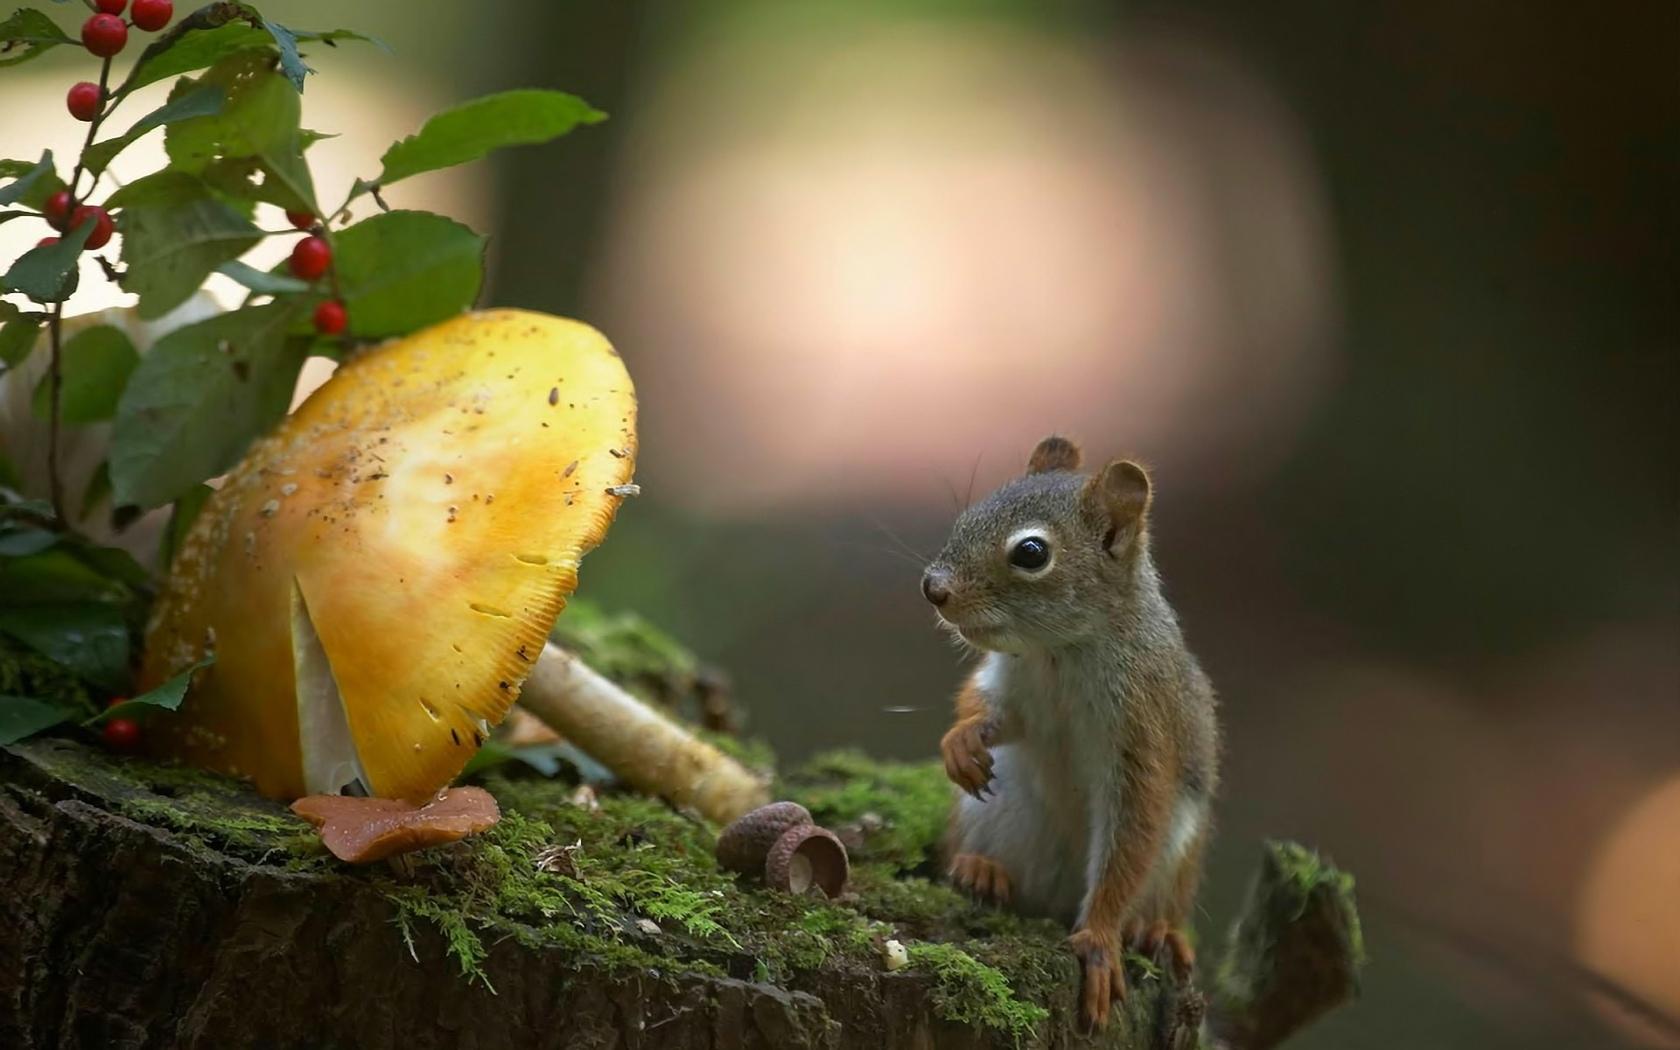 животные, мох, макрос, гриб, бурундуки